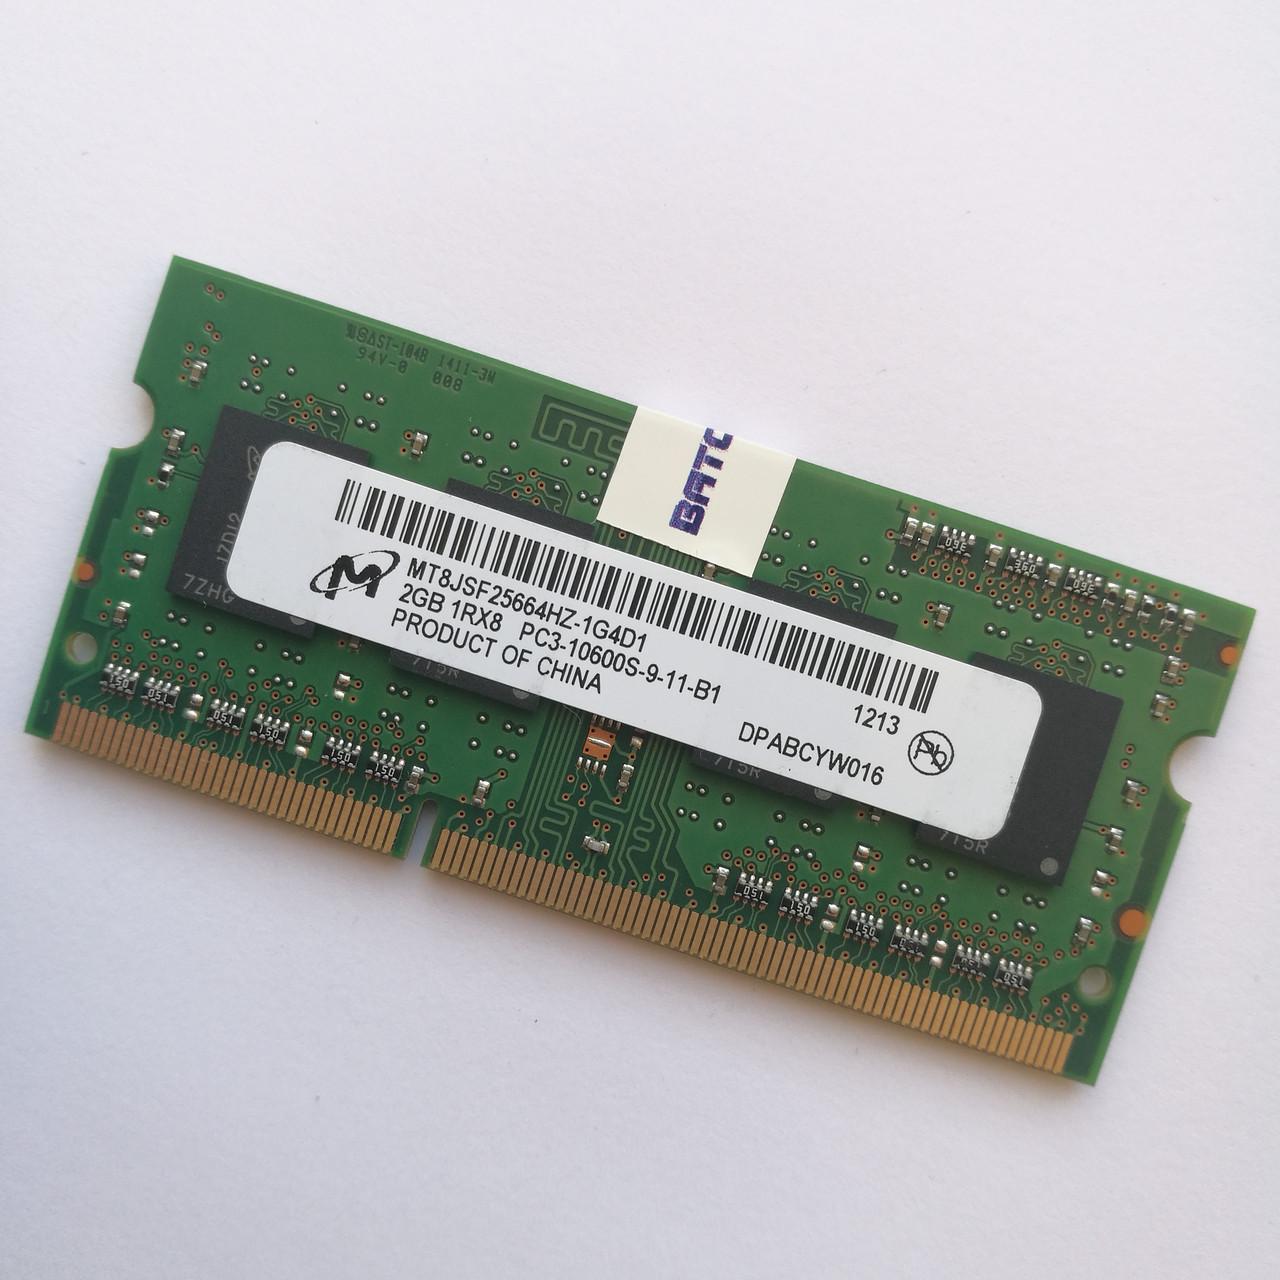 Оперативная память для ноутбука Micron SODIMM DDR3 2Gb 1333MHz 10600s CL9 (MT8JSF25664HZ-1G4D1) Б/У